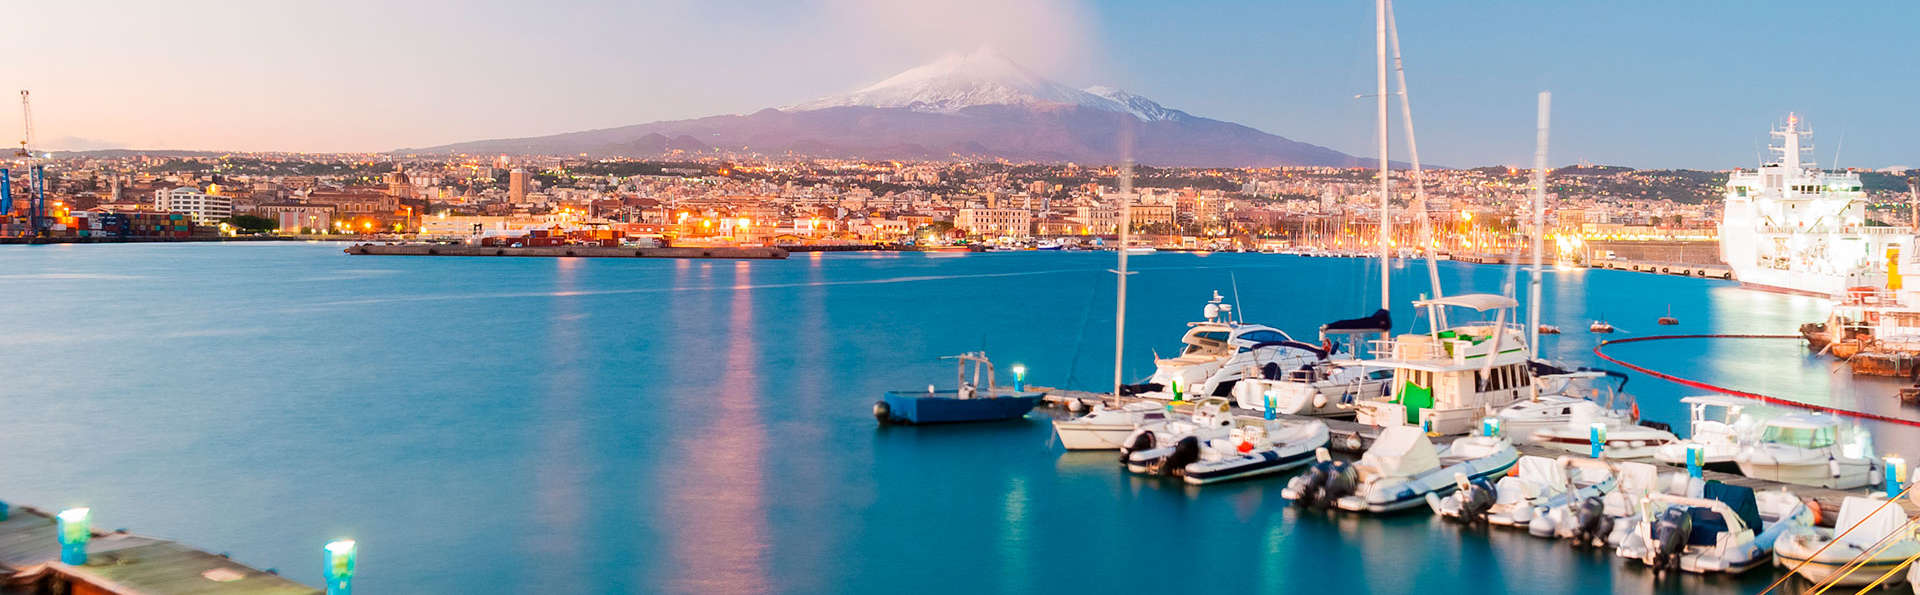 Etna Hotel - EDIT_ETNA3.jpg